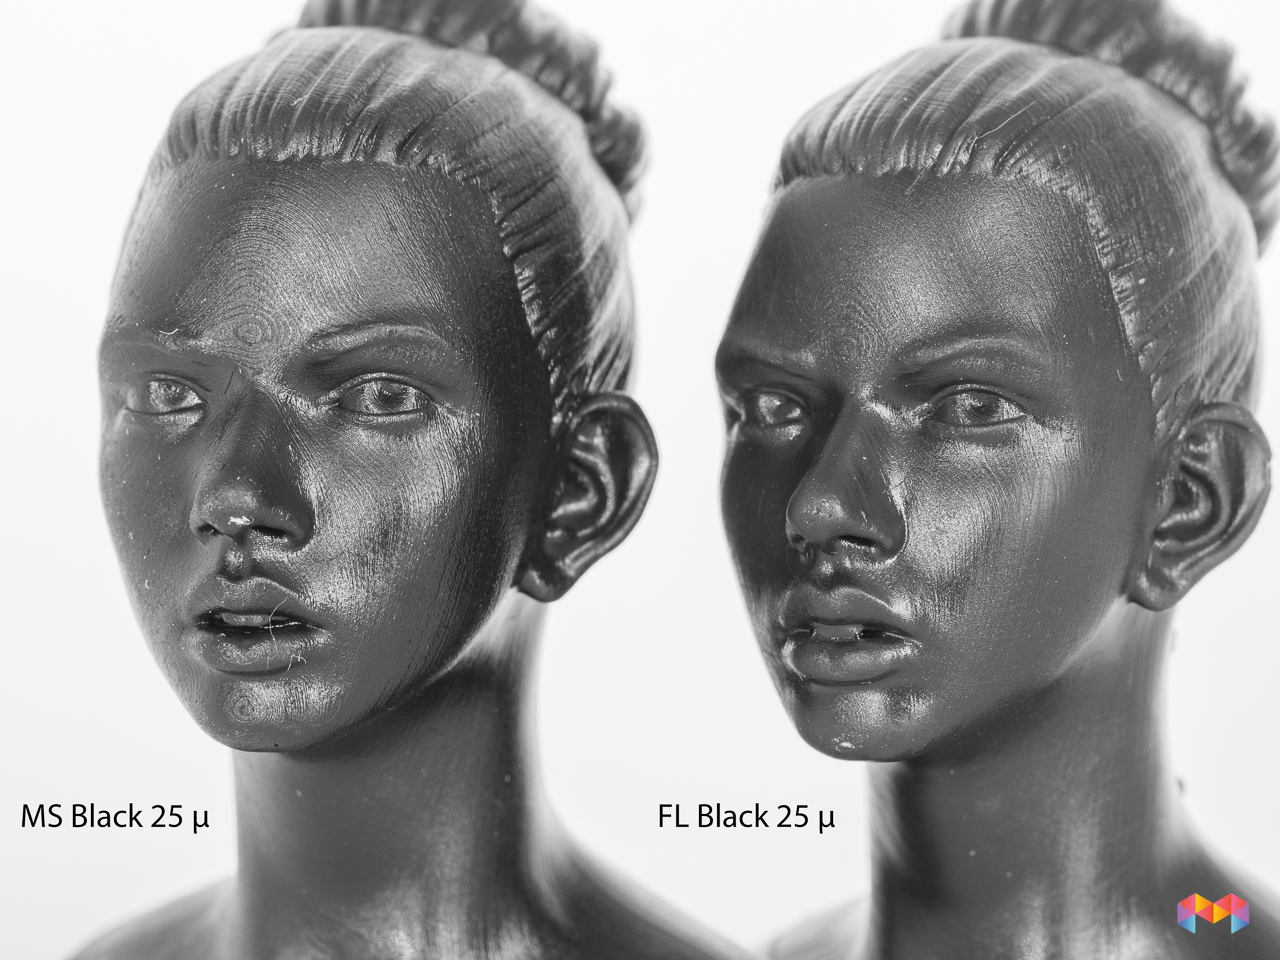 3D_printed_heads_02